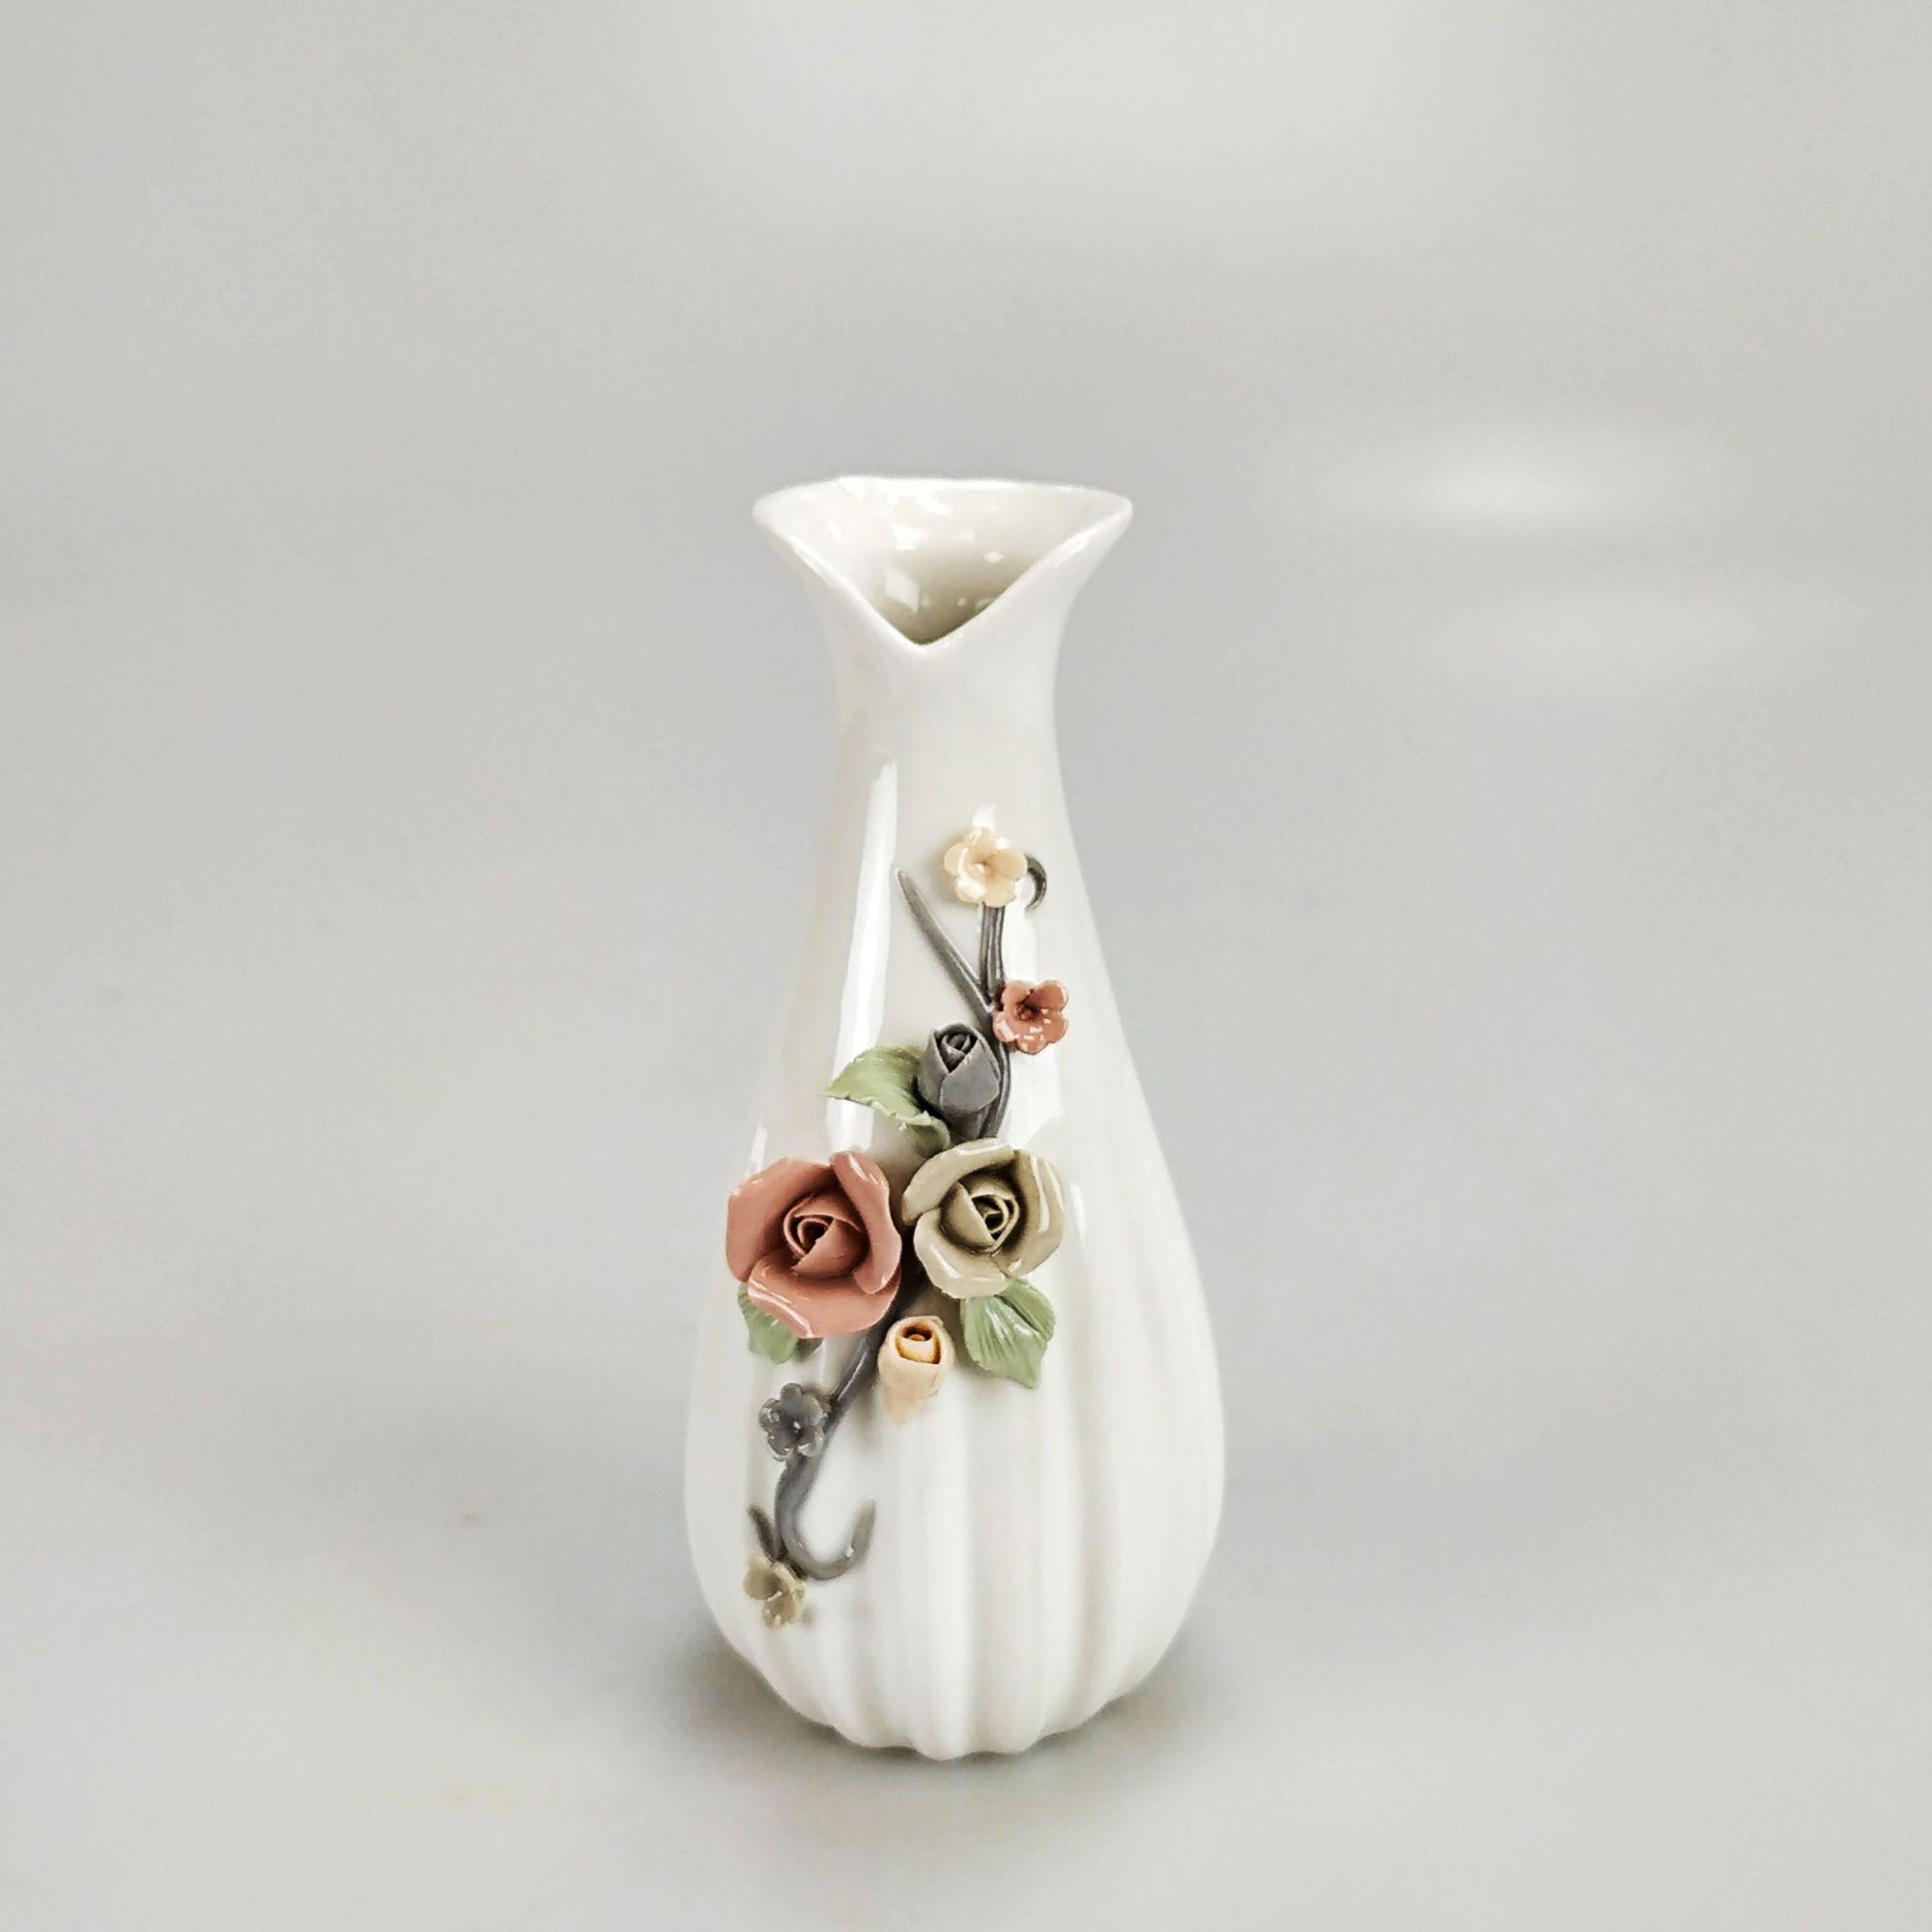 Vaso de Porcelana 15 cm